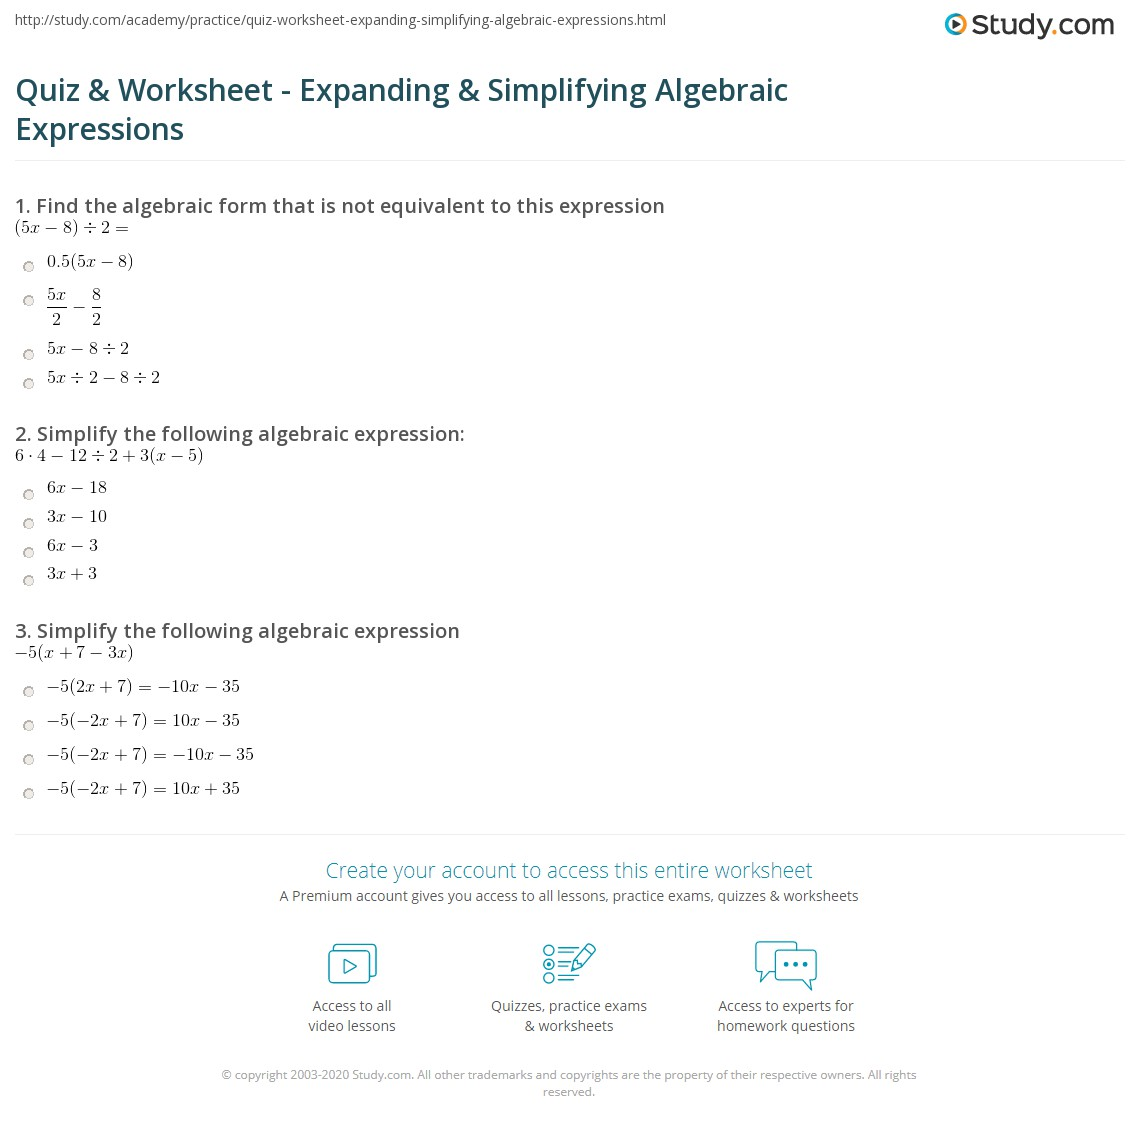 quiz worksheet expanding simplifying algebraic expressions. Black Bedroom Furniture Sets. Home Design Ideas